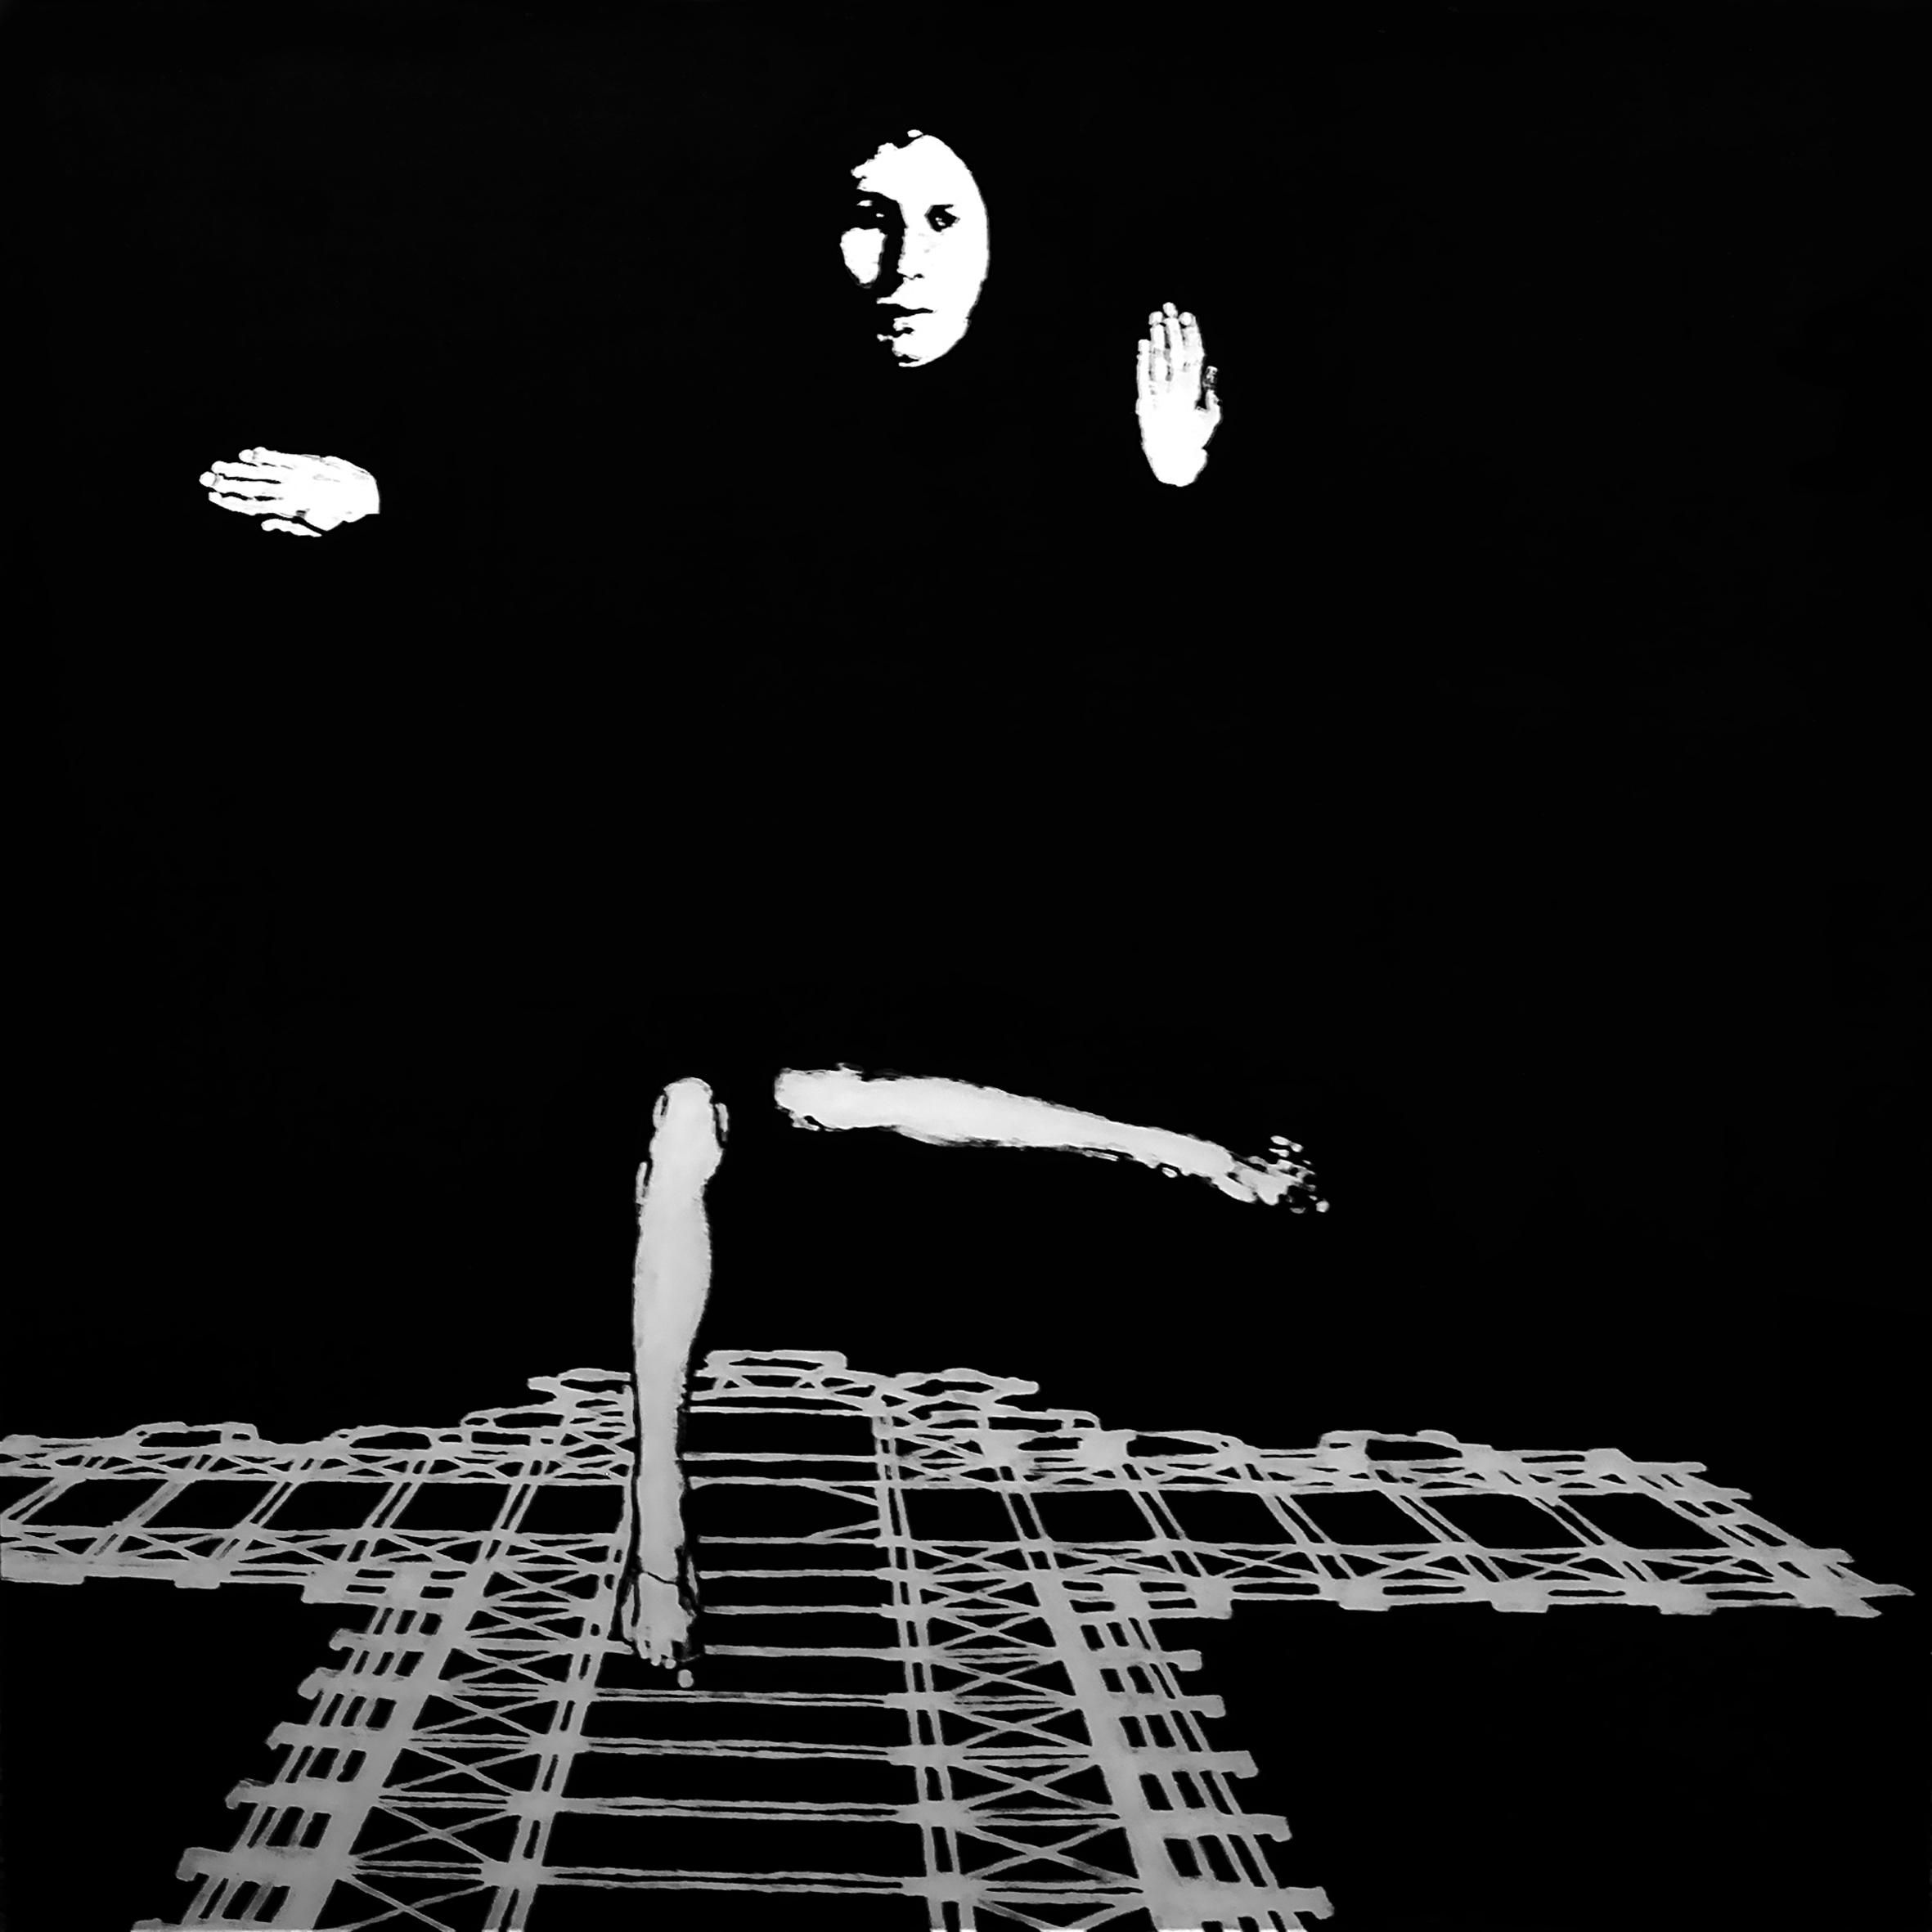 Corpus Christi/corpus delicti, 100 x 100, akryl na pleksi, 2011